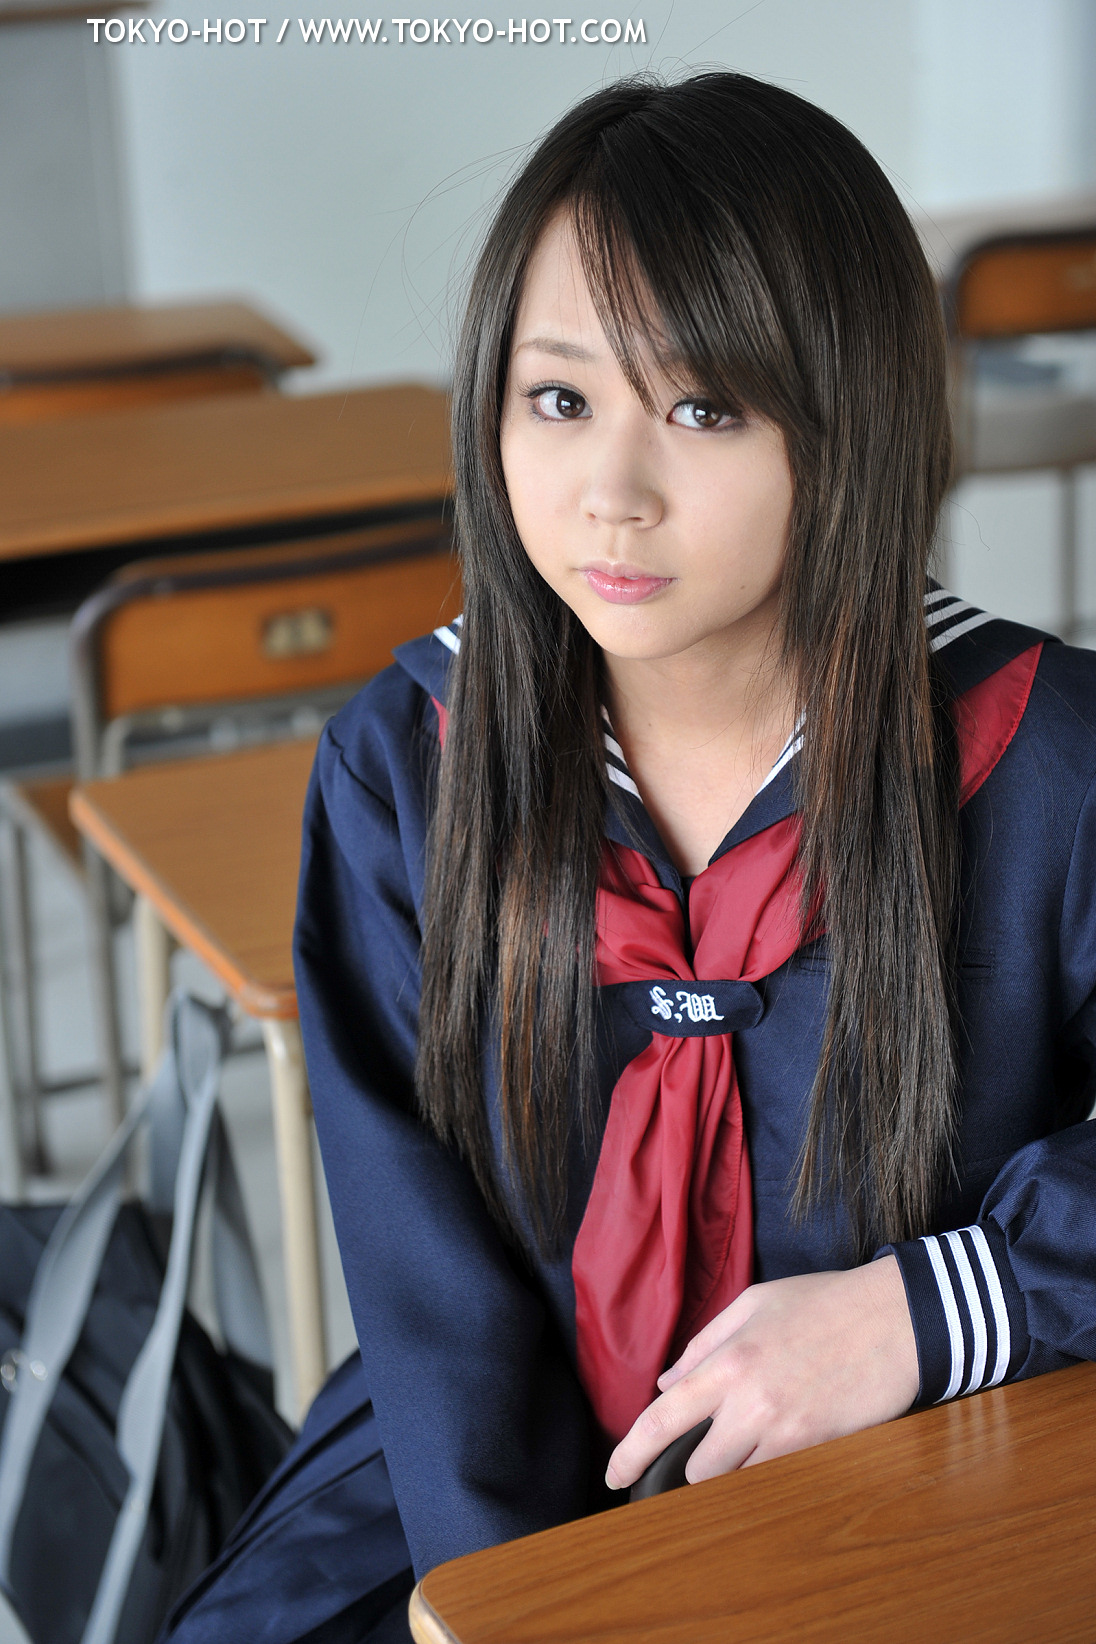 Tokyo-Hot > [Tokyo-Hot] e643 堀北真里 Mari Horikita [1543P/755MB]